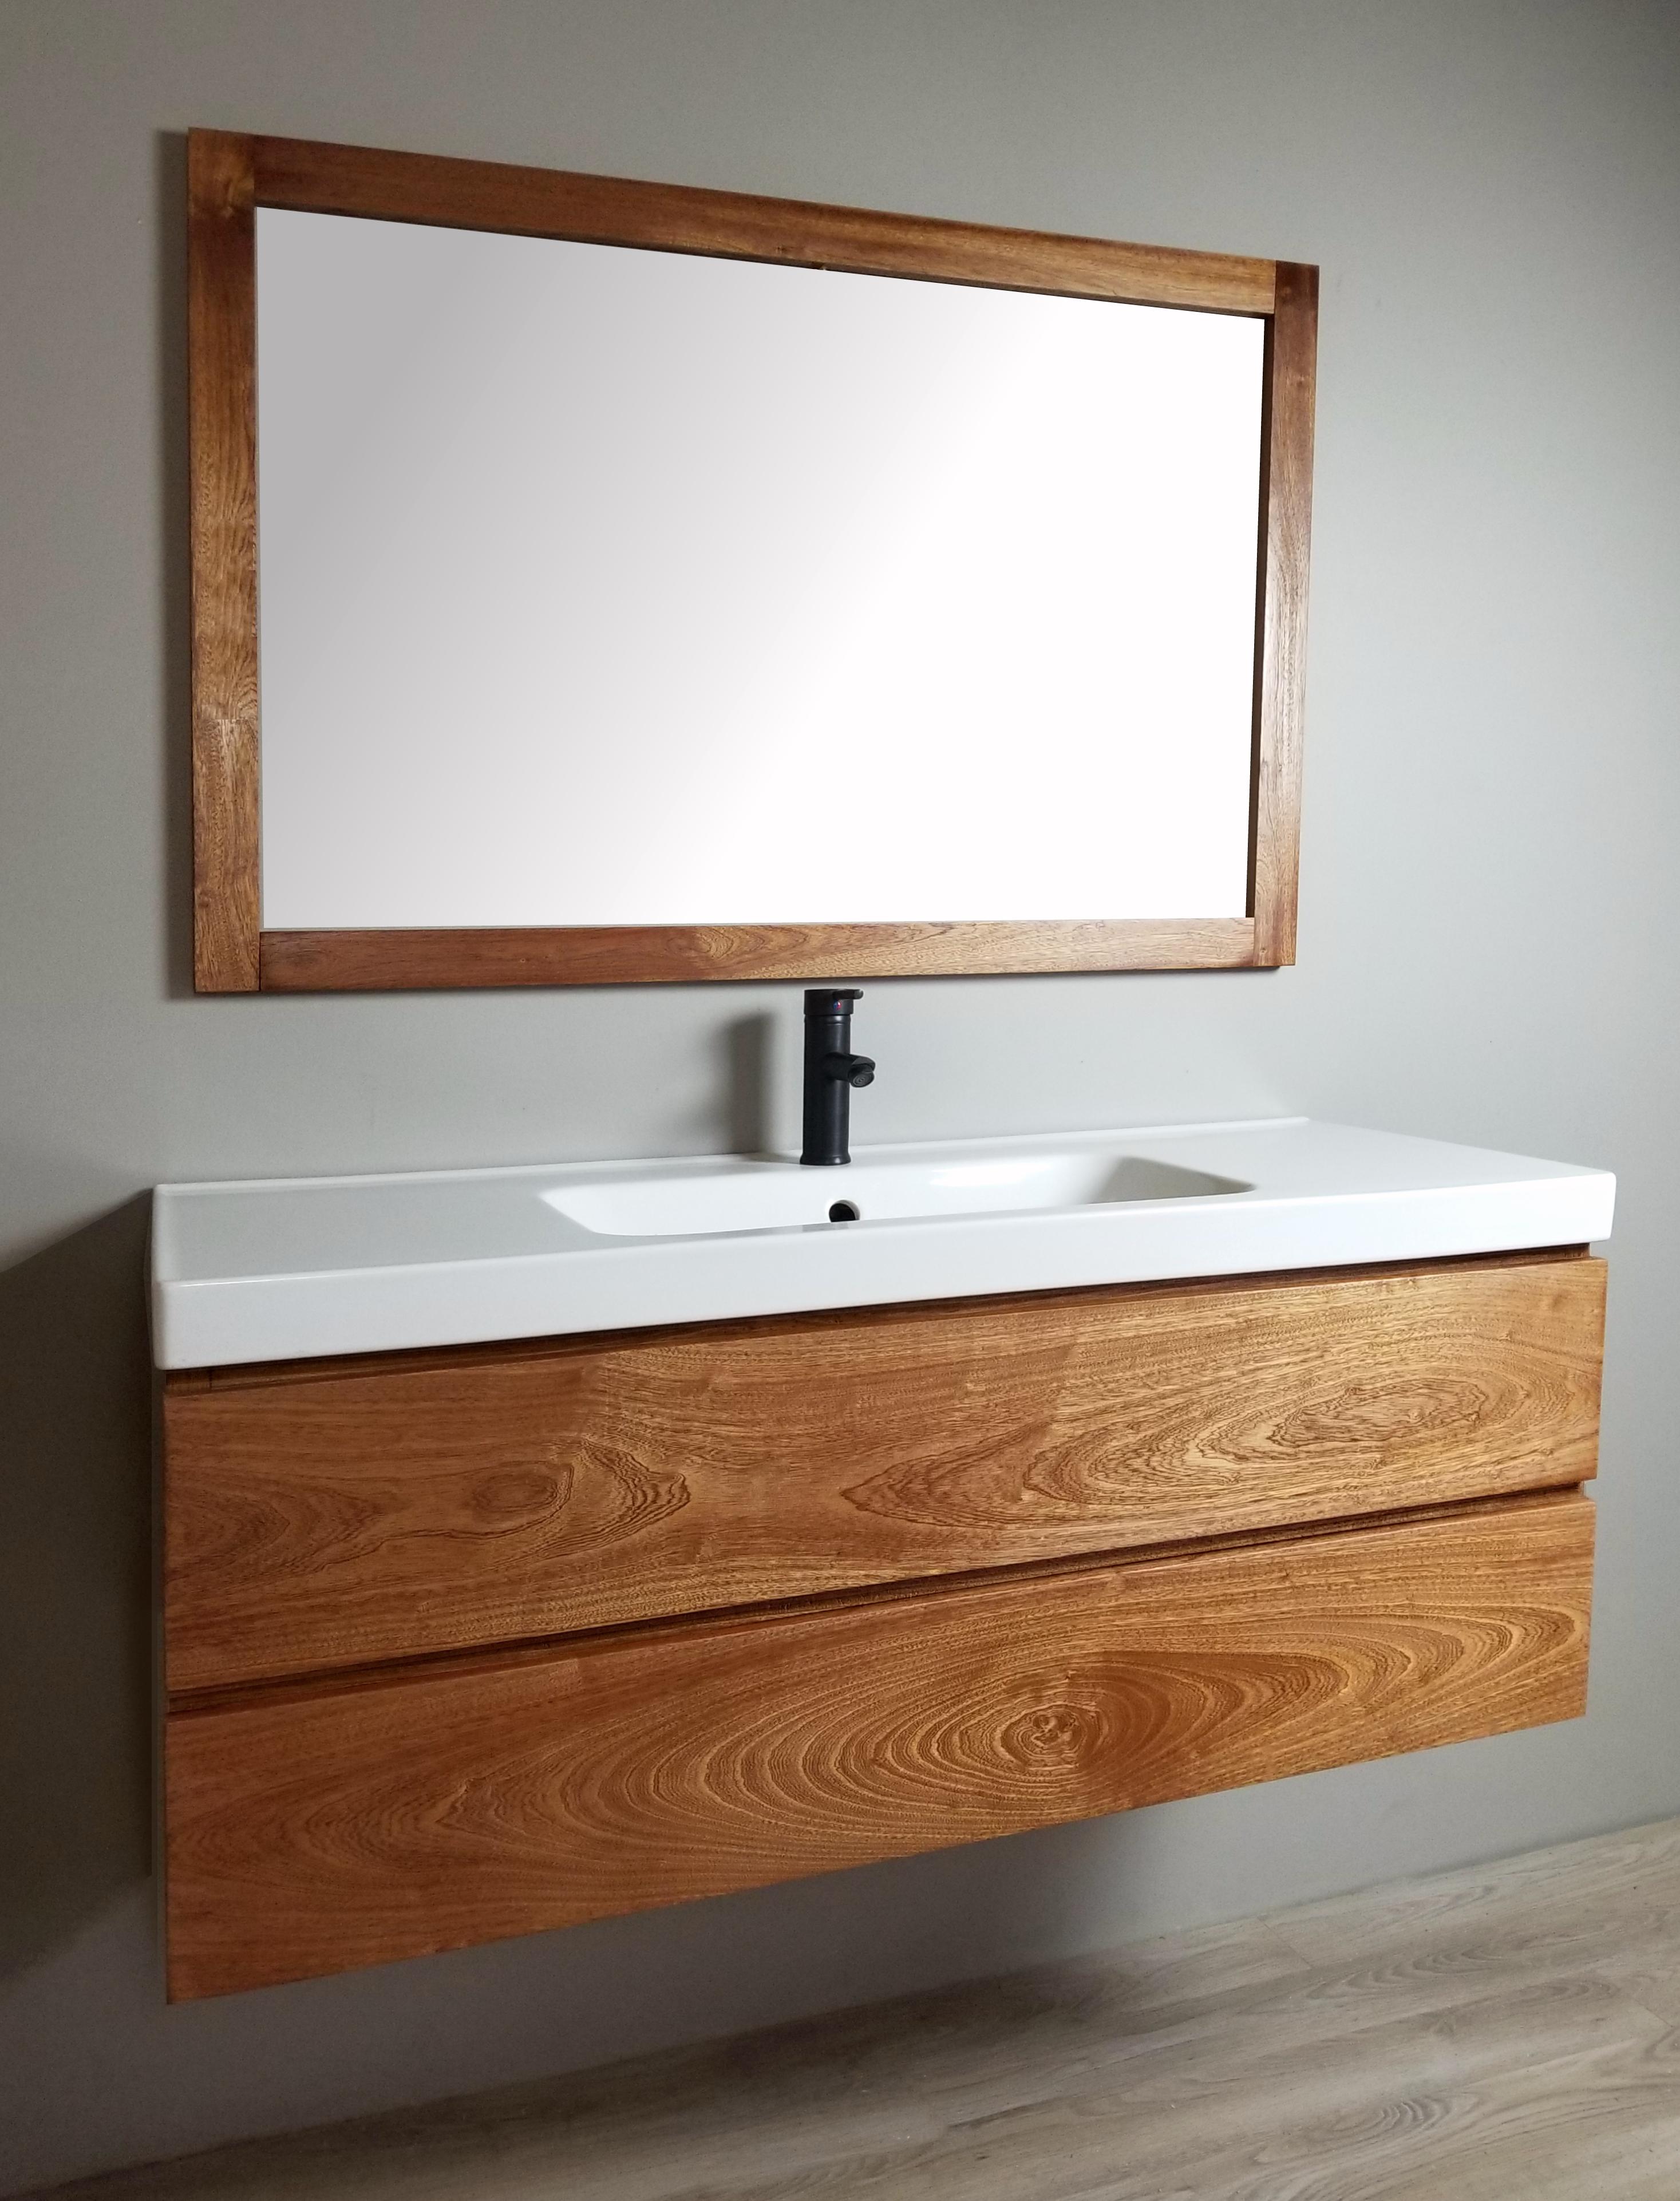 Sapele Vanity Custom Bathroom Vanity Beautiful Bathrooms Floating Bathroom Vanity [ 3845 x 2935 Pixel ]